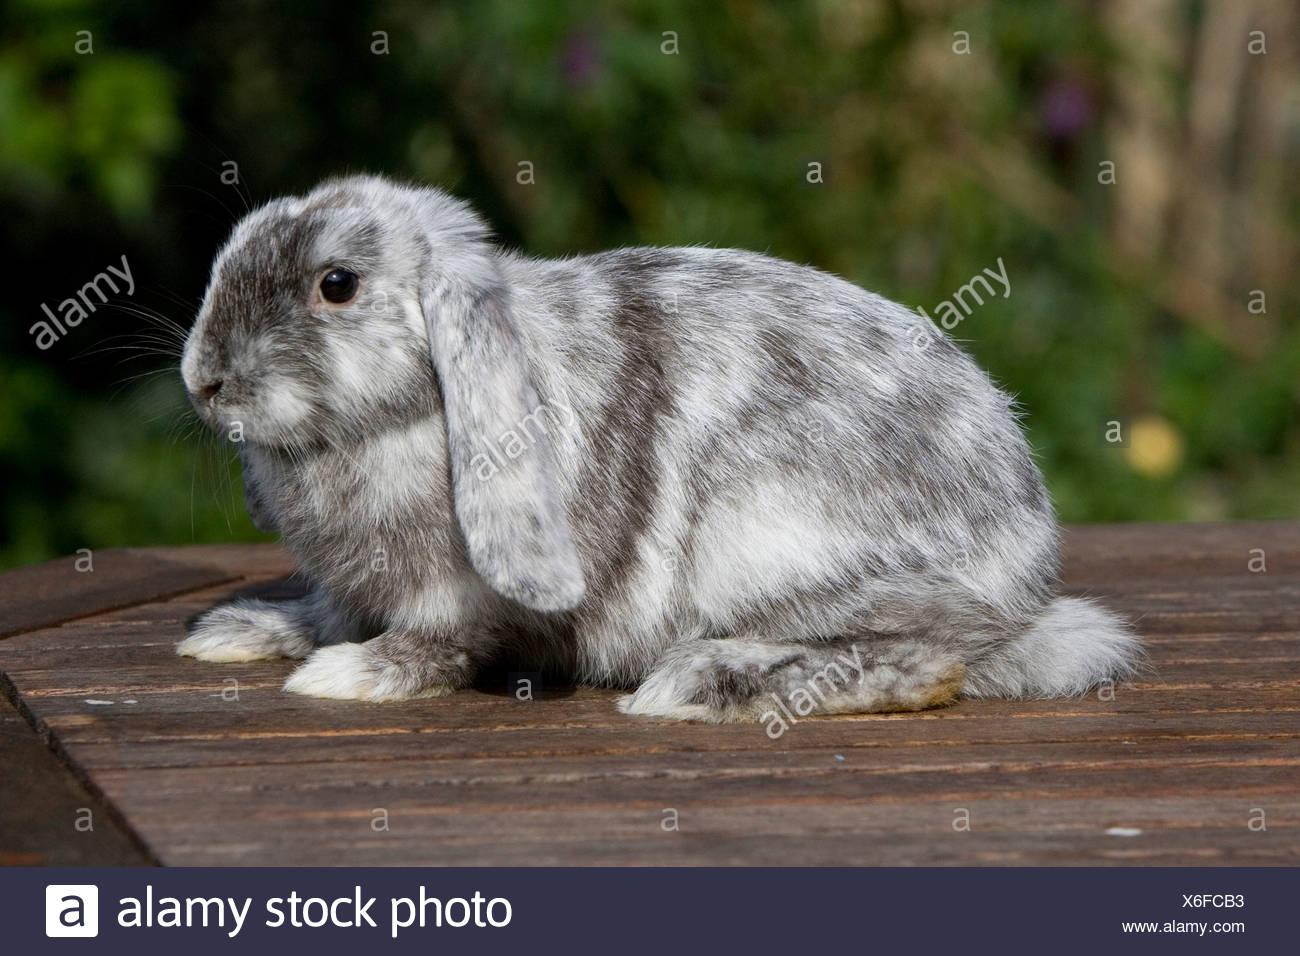 English Lop, rabbit breed - Stock Image